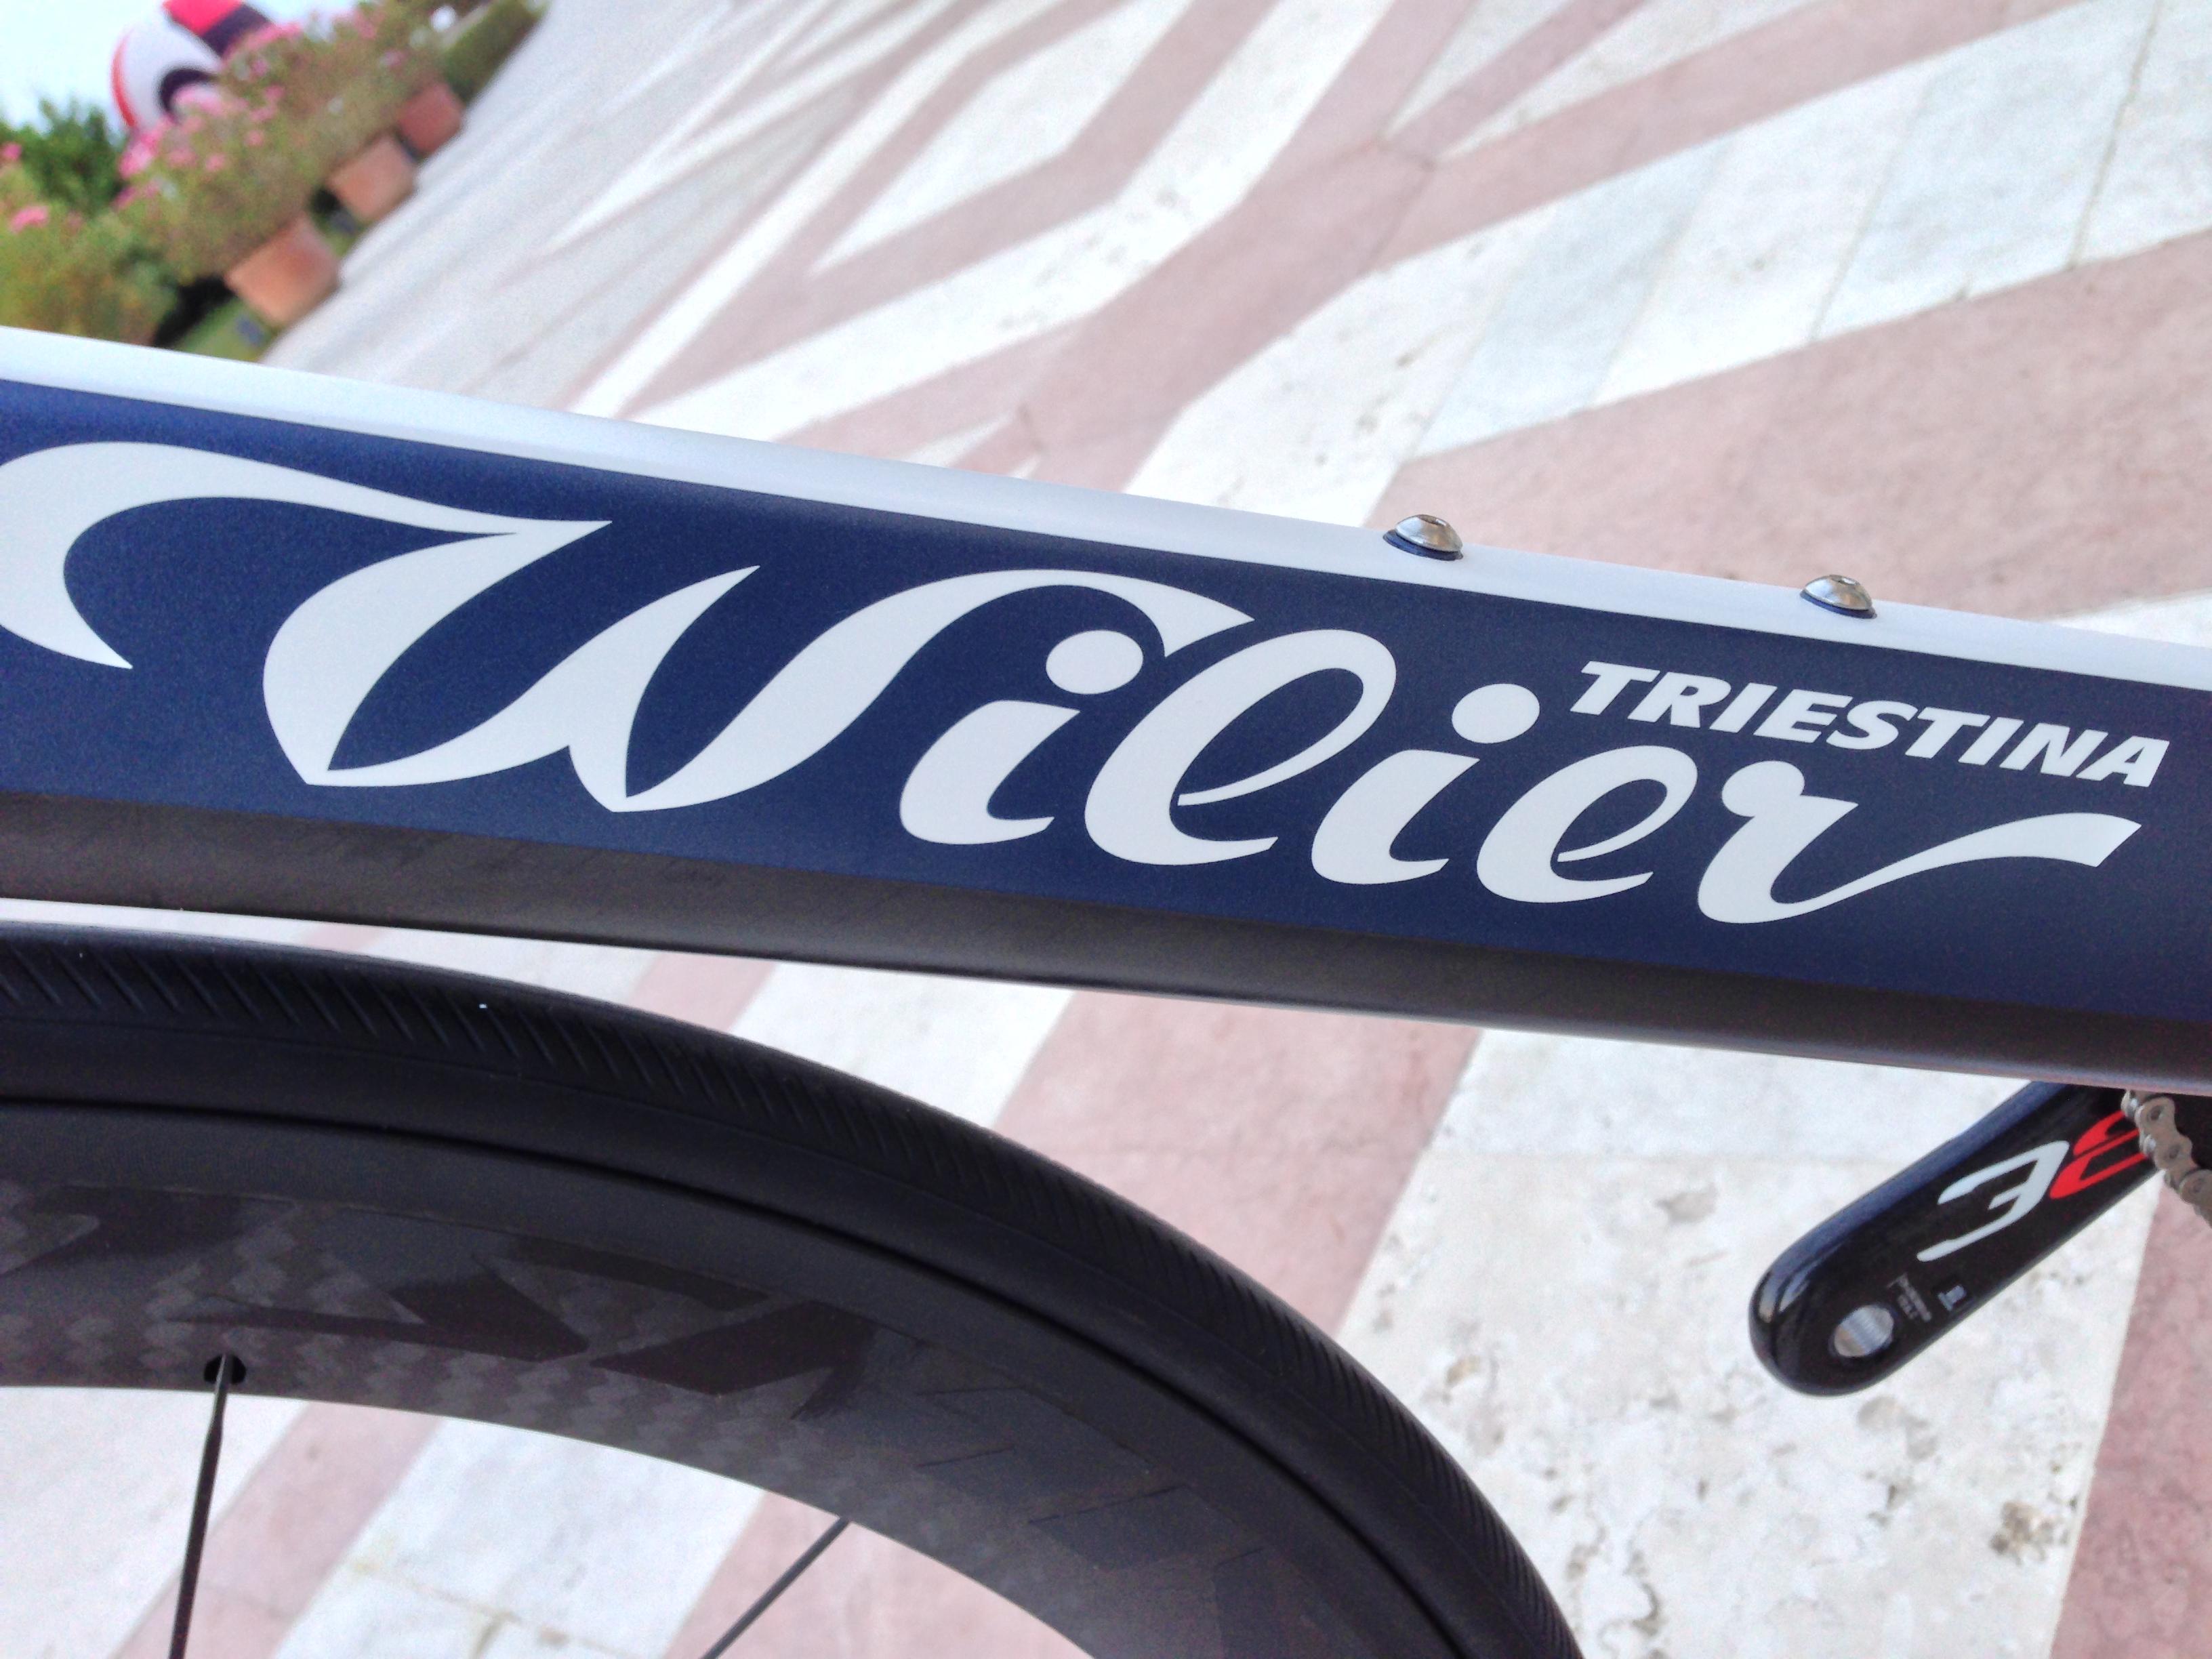 wilier cento1 air 2014